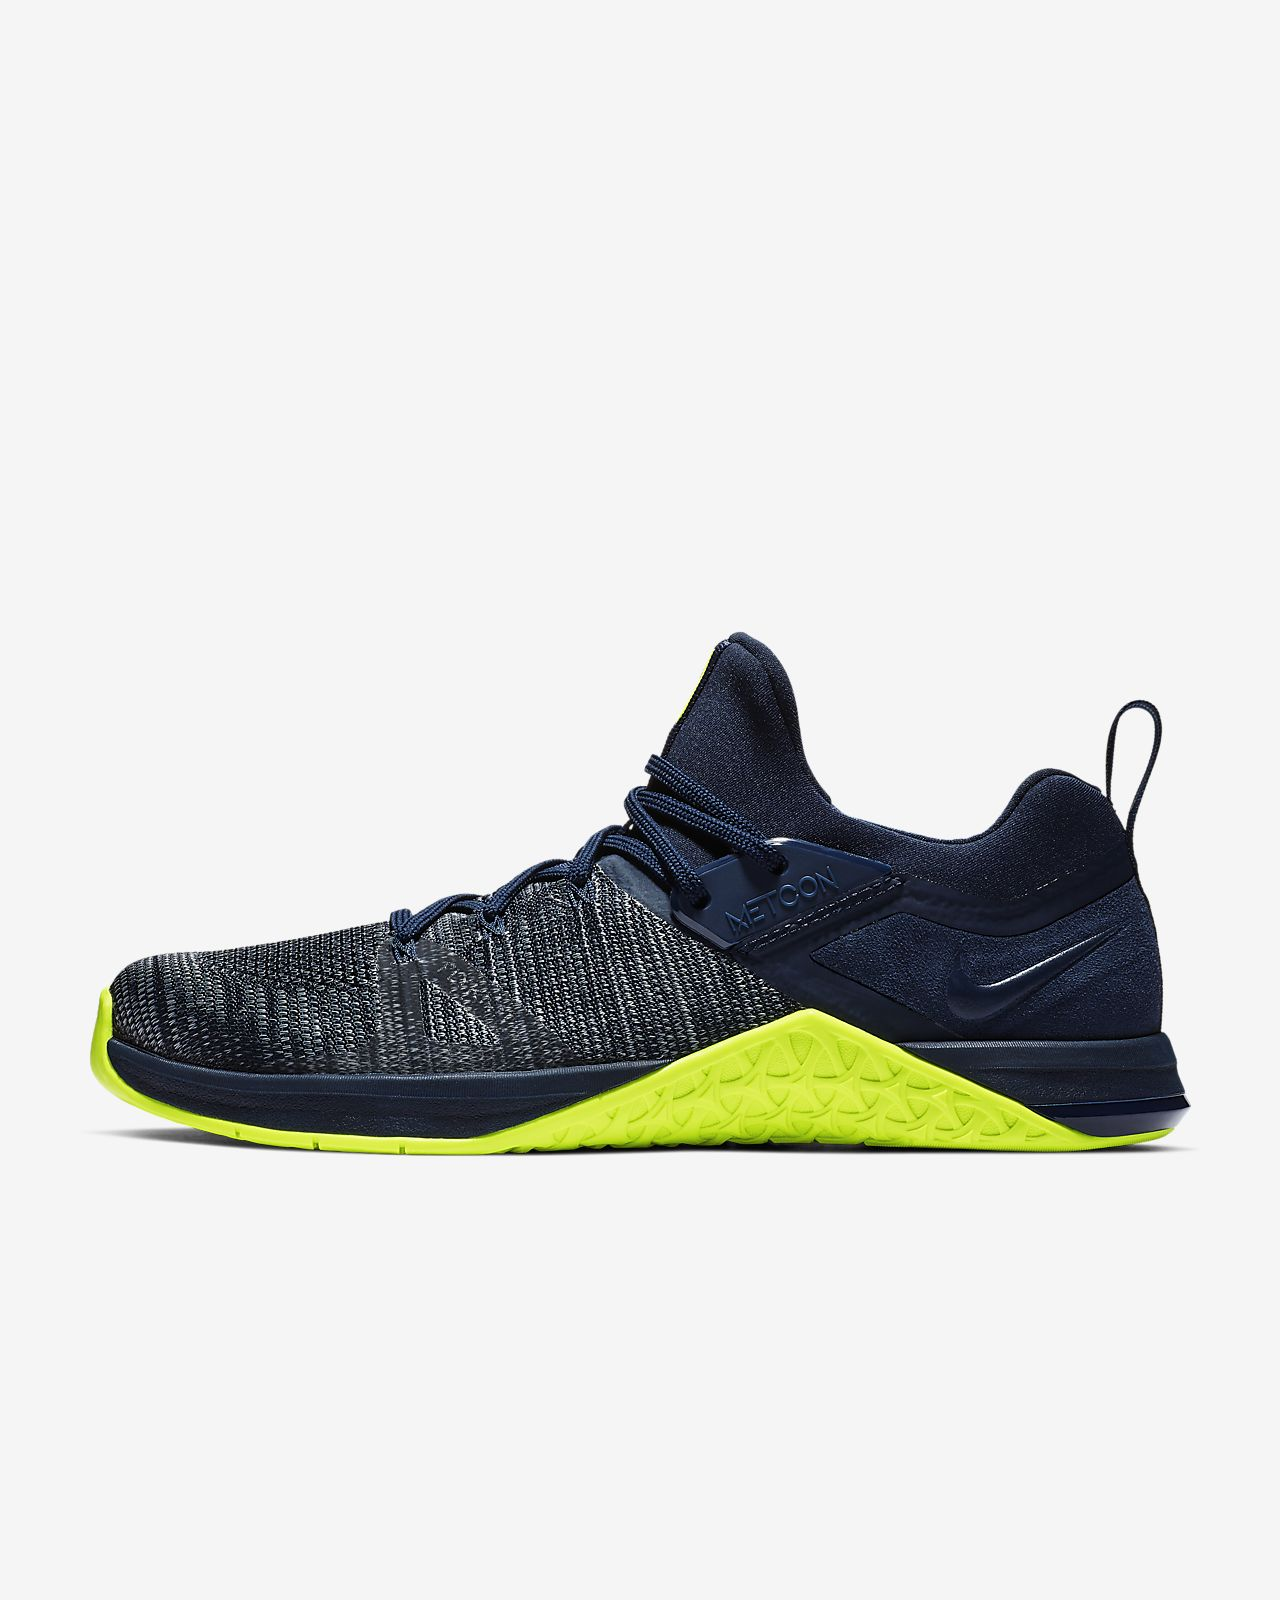 hot sale online 0cb9e 8be5c Men s Cross-Training Weightlifting Shoe. Nike Metcon Flyknit 3